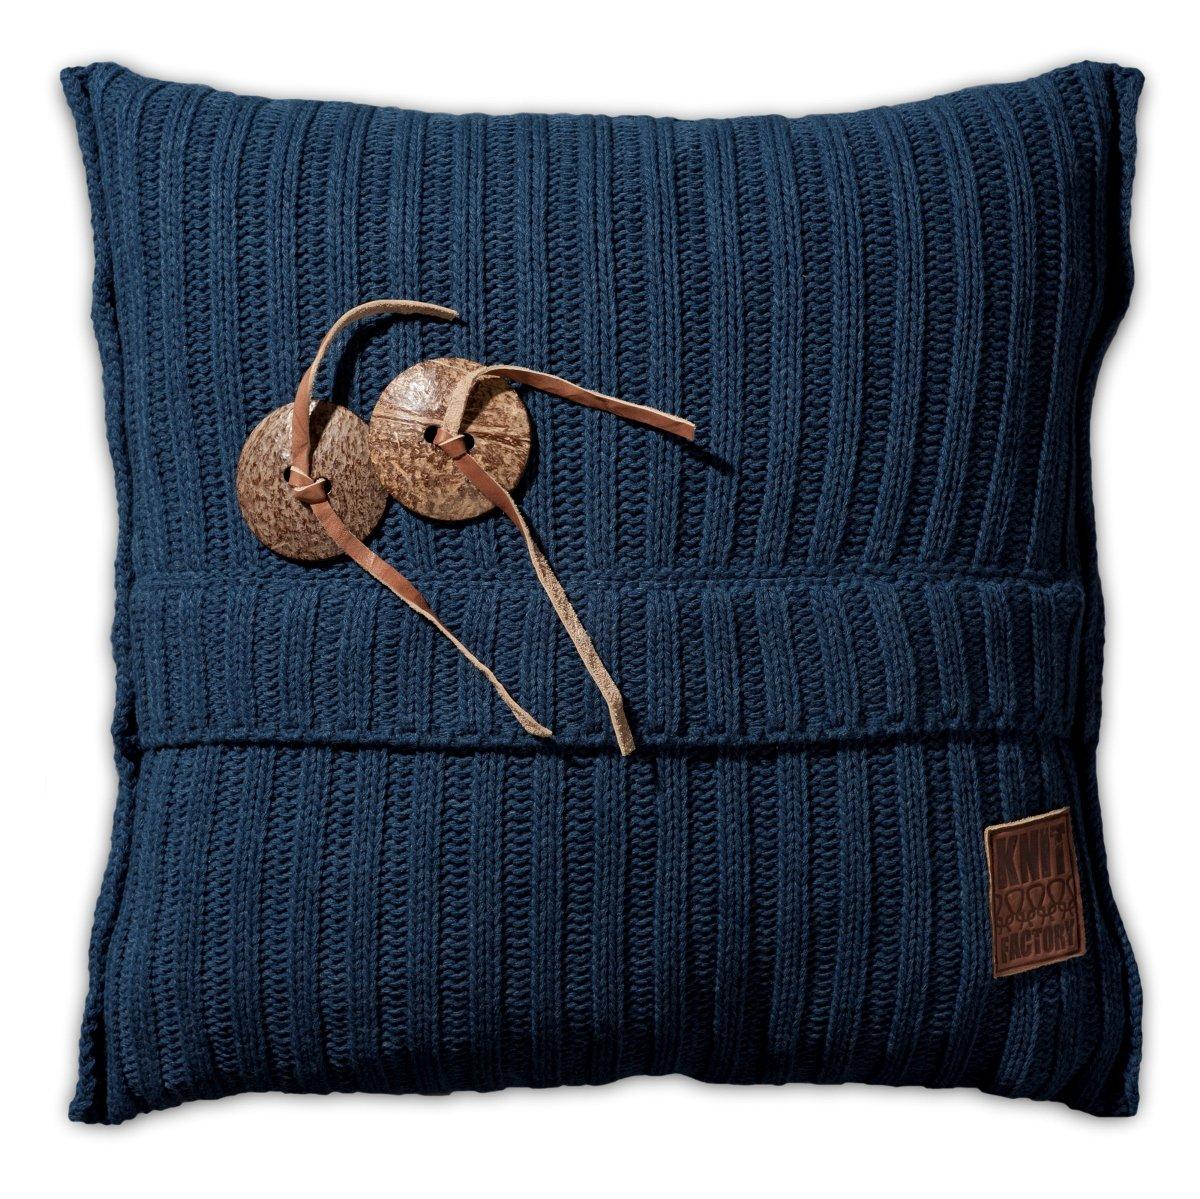 Knit Factory 101213 Dekokissen Strickkissen Aran   50 x 50 cm Jeans mit Füllung